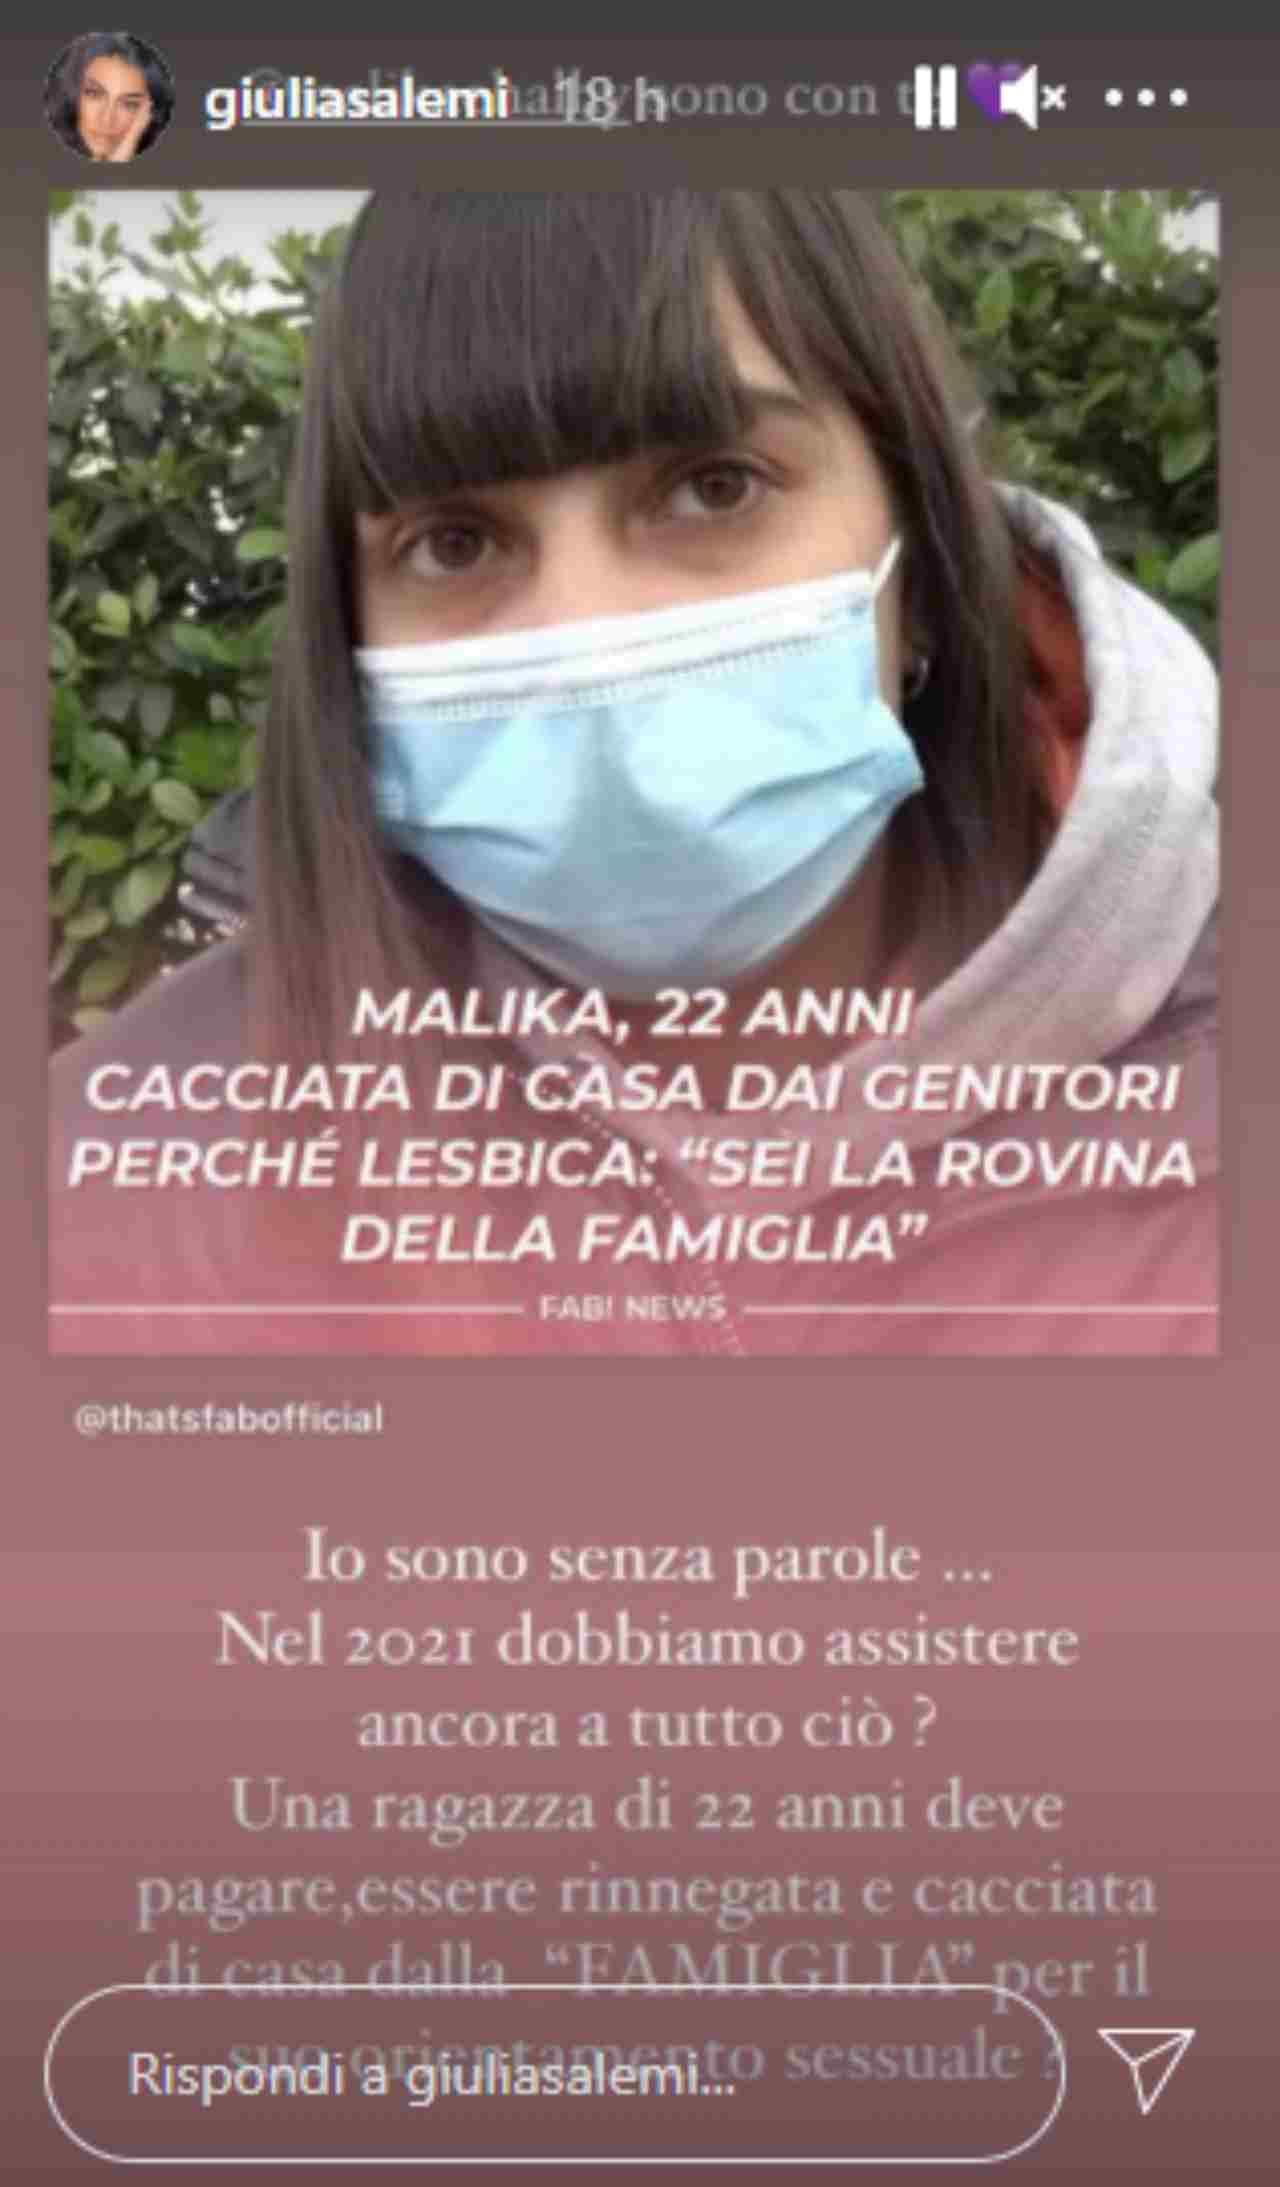 Giulia Salemi incalza sui social